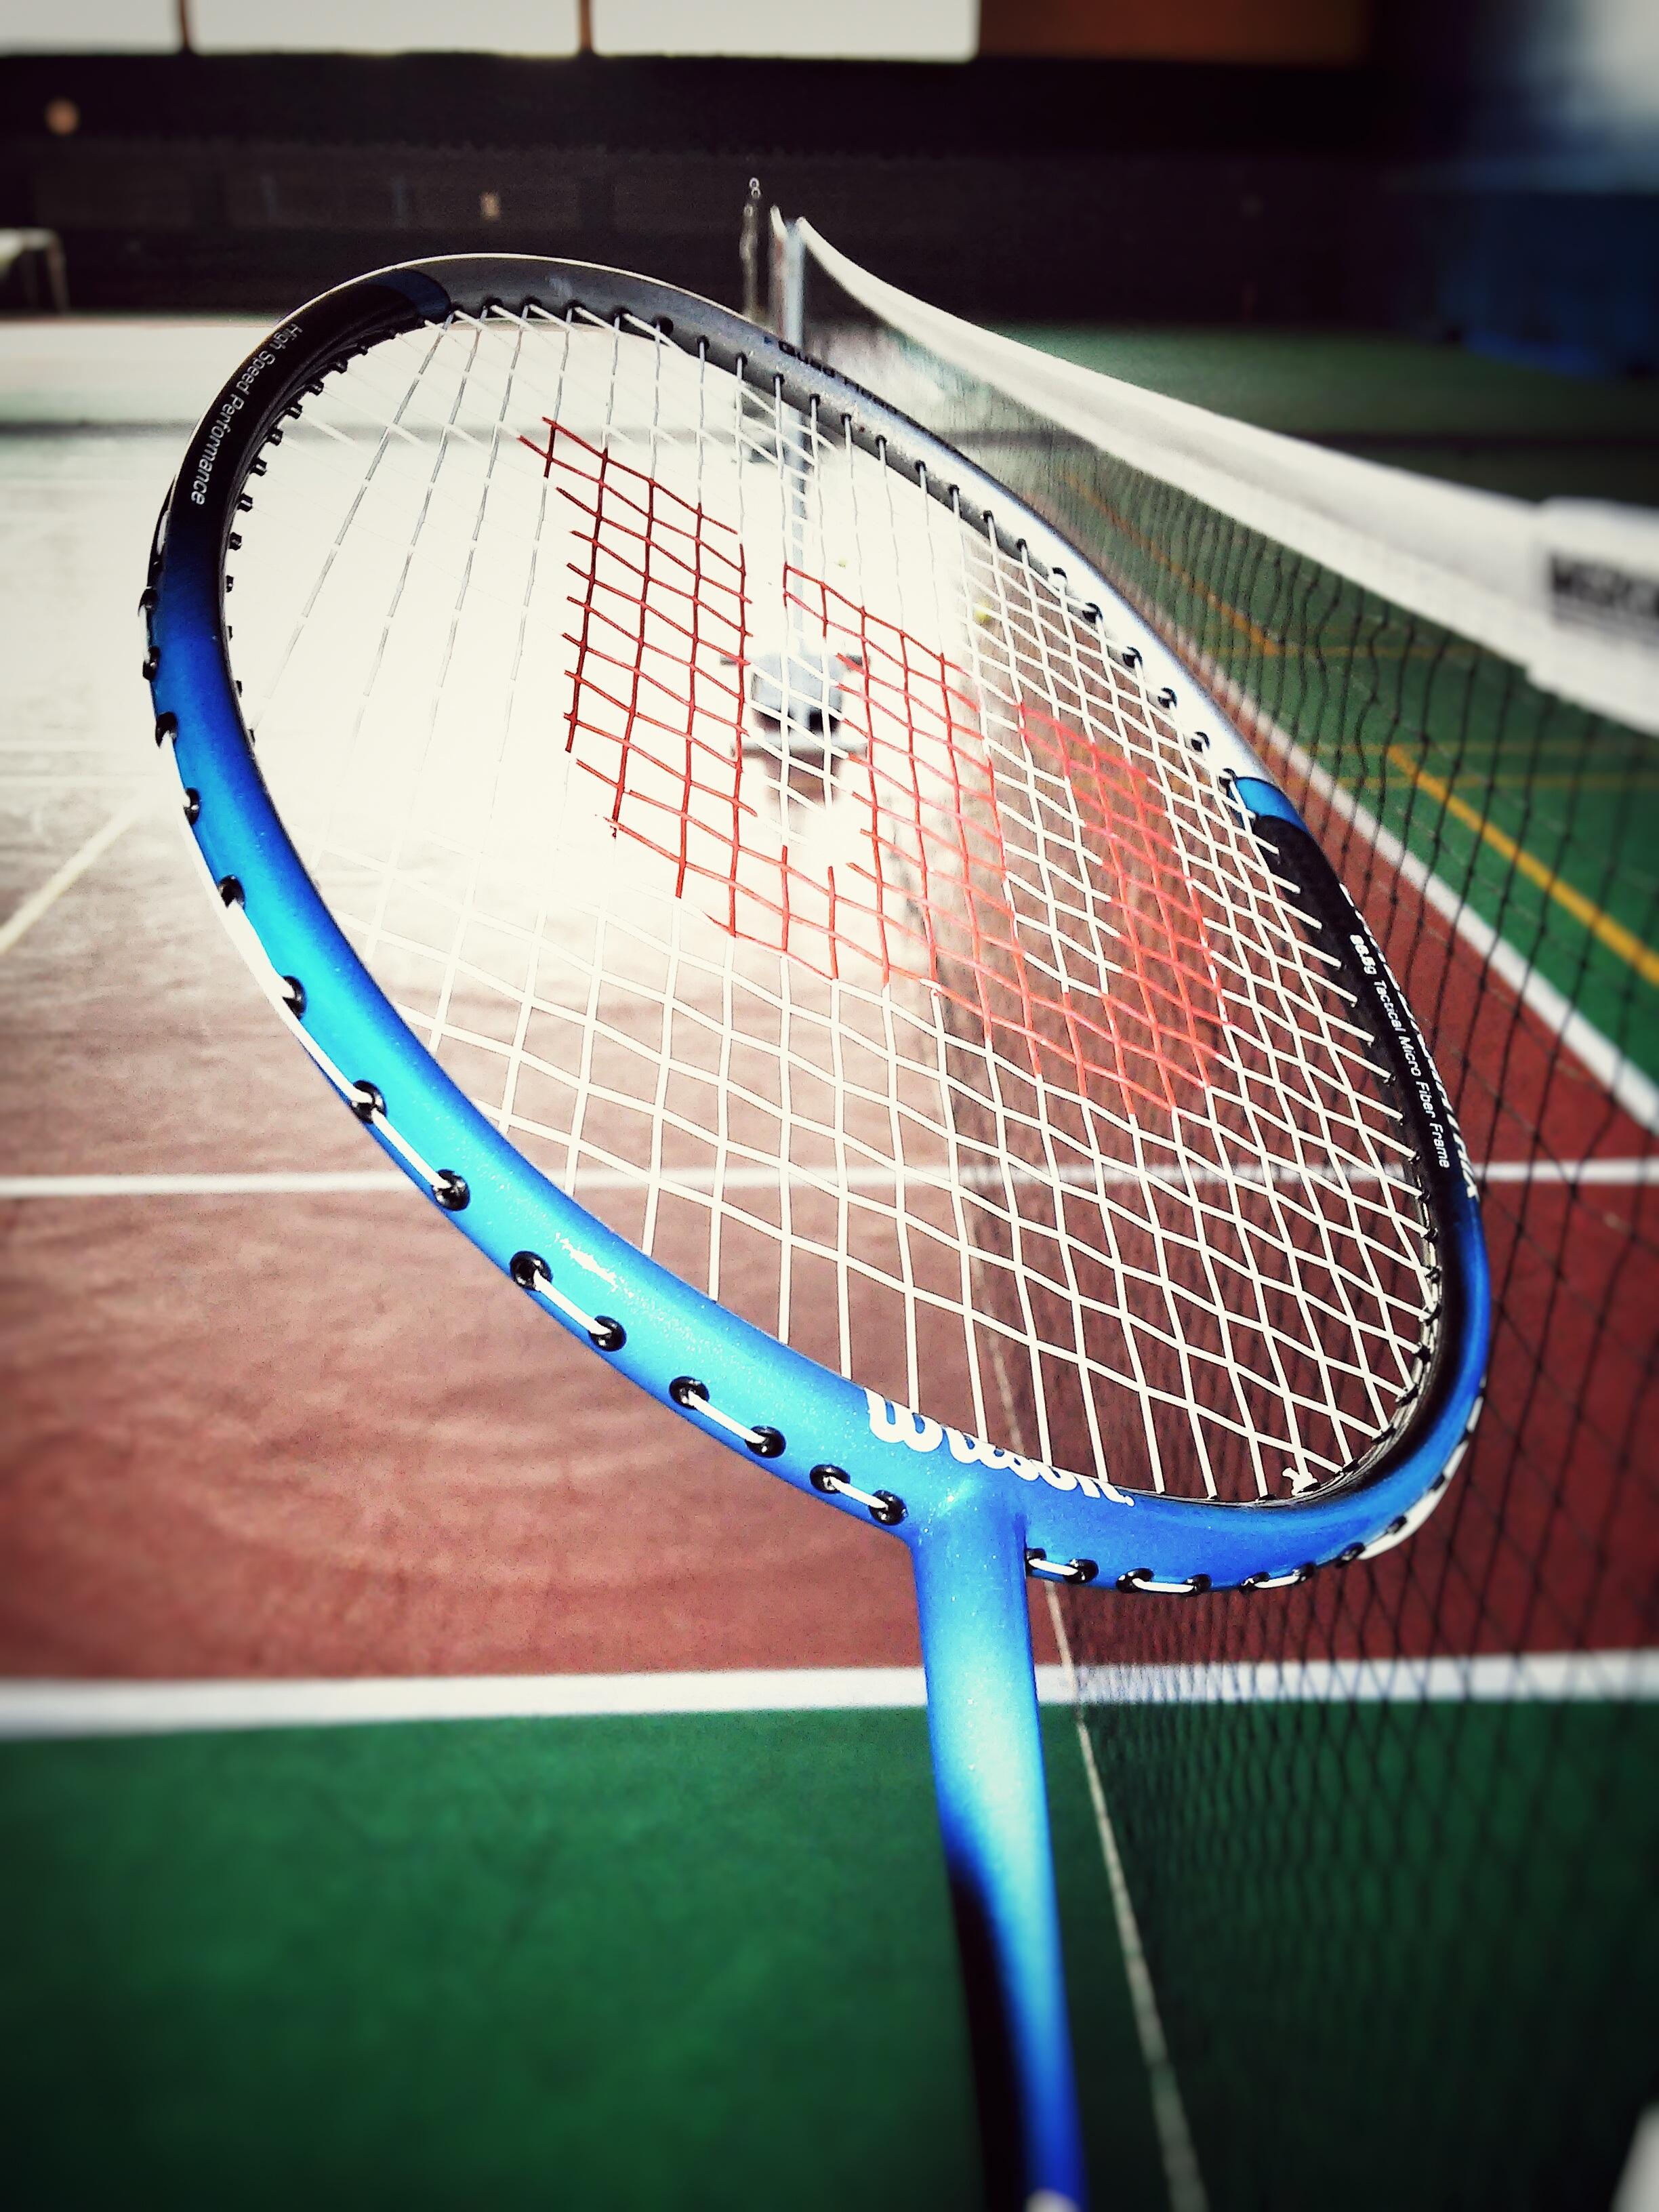 0147412f sport rakett sportsutstyr tennis sport nett ball strenger underholdning  badminton retten sportssted racquet sport racketer tennisracket